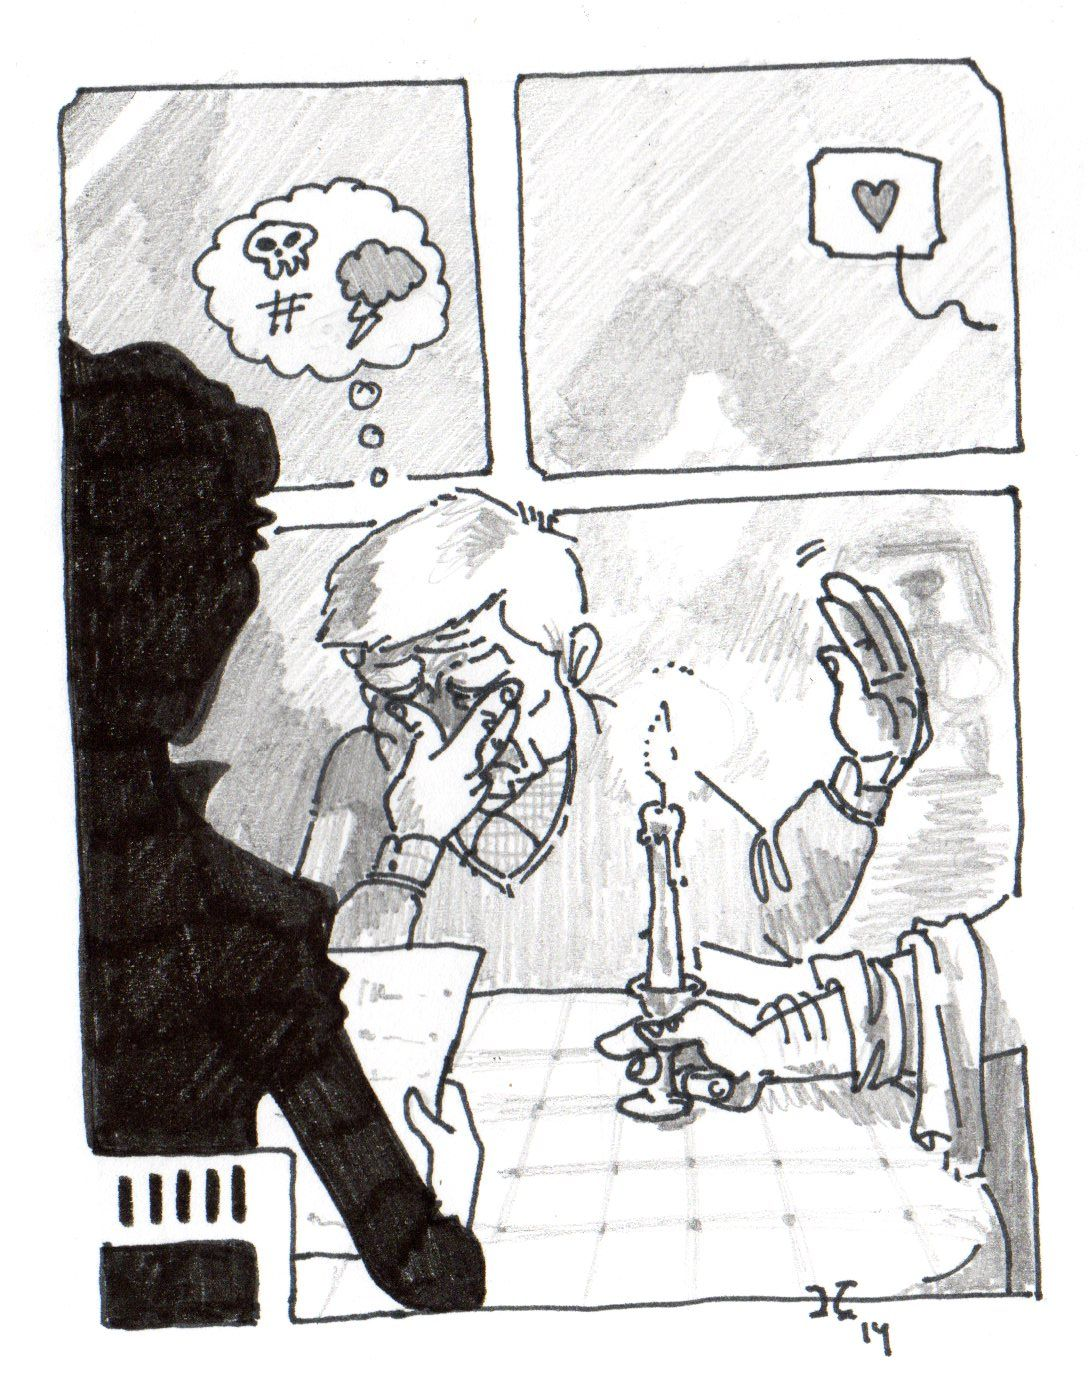 Sherlock -A Study in Pink- Holmes (Benedict Cumberbatch) & Watson (Martin Freeman). He's not his date! January, 2014